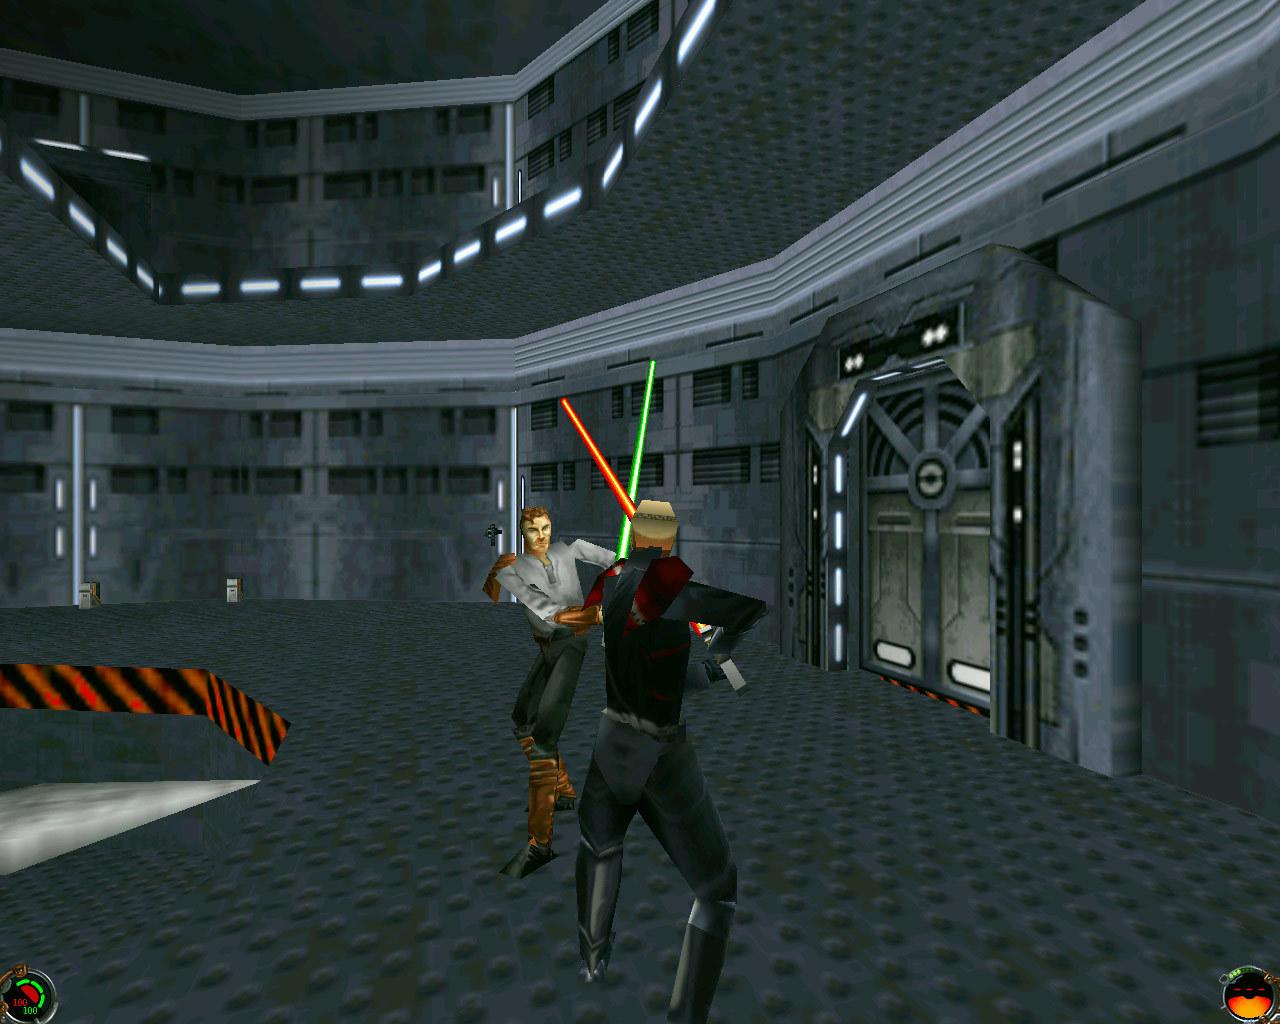 star wars jedi knight jedi academy free download full game pc